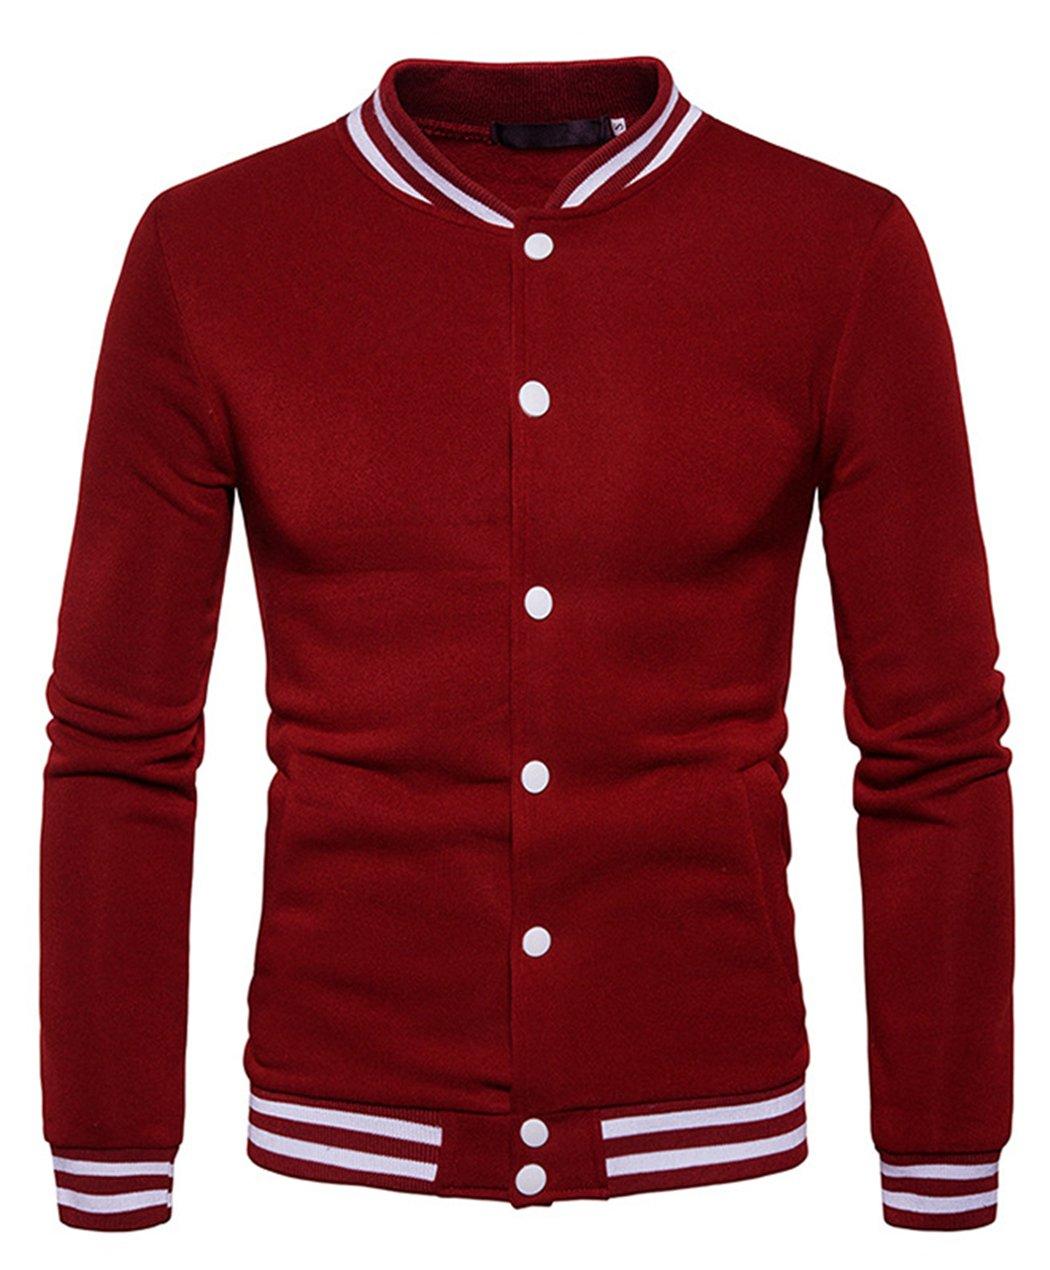 HOP FASHION Mens Casual Long Sleeve Baseball Collar Button Down Varsity Jacket Elastic Hem Lightweight Sport Cotton Coat with Pockets HOPM185-Burgundy-S by HOP FASHION